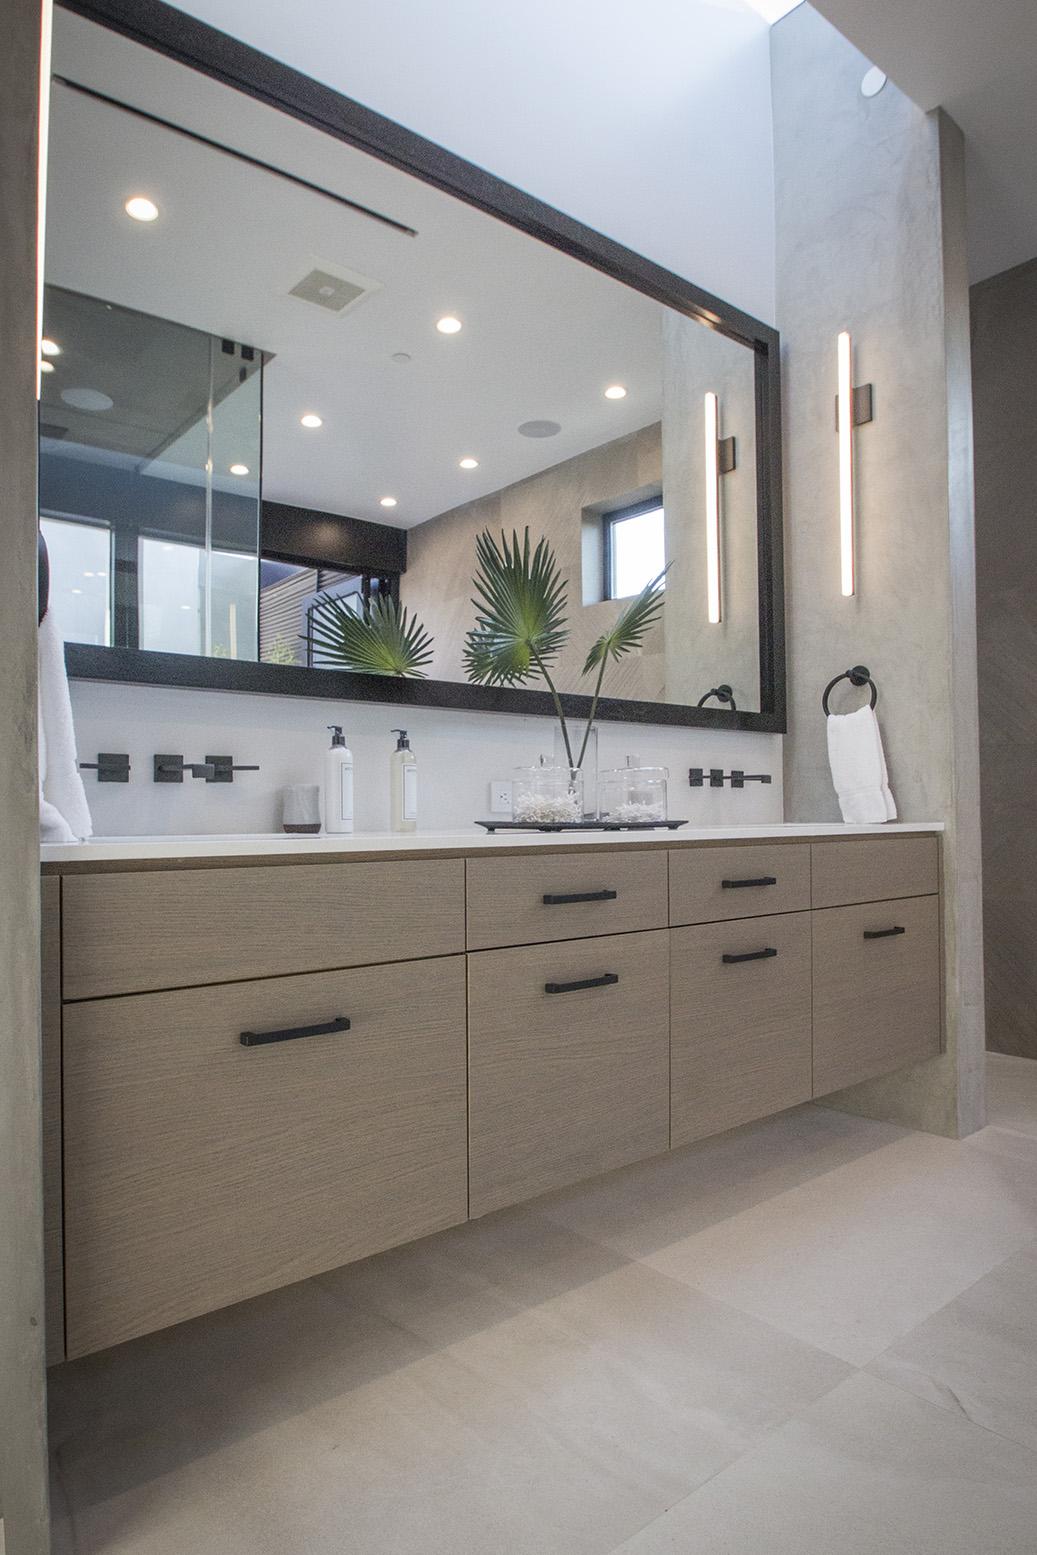 Maryland Drive House - Bathroom 4